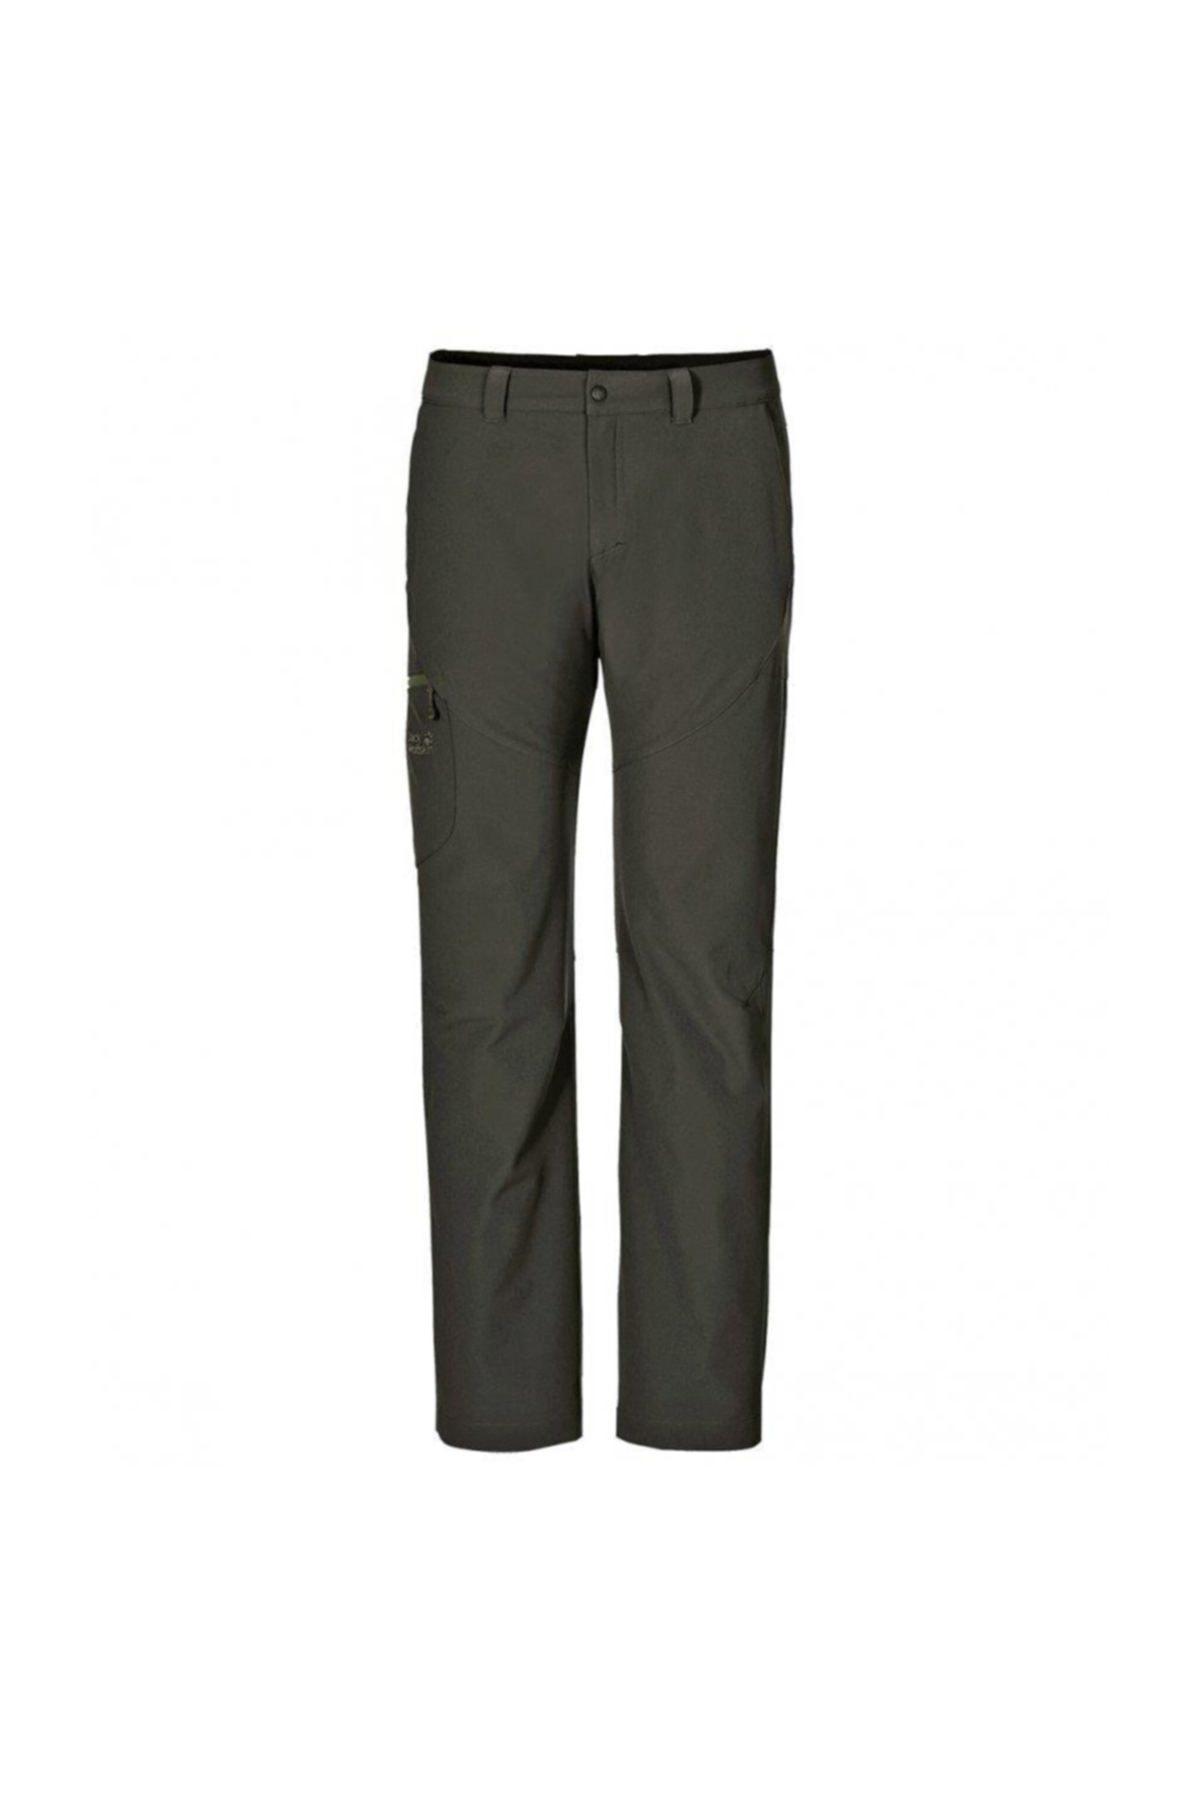 Jack Wolfskin Chilly Track XT Erkek Pantolon - 1502381-5100 1